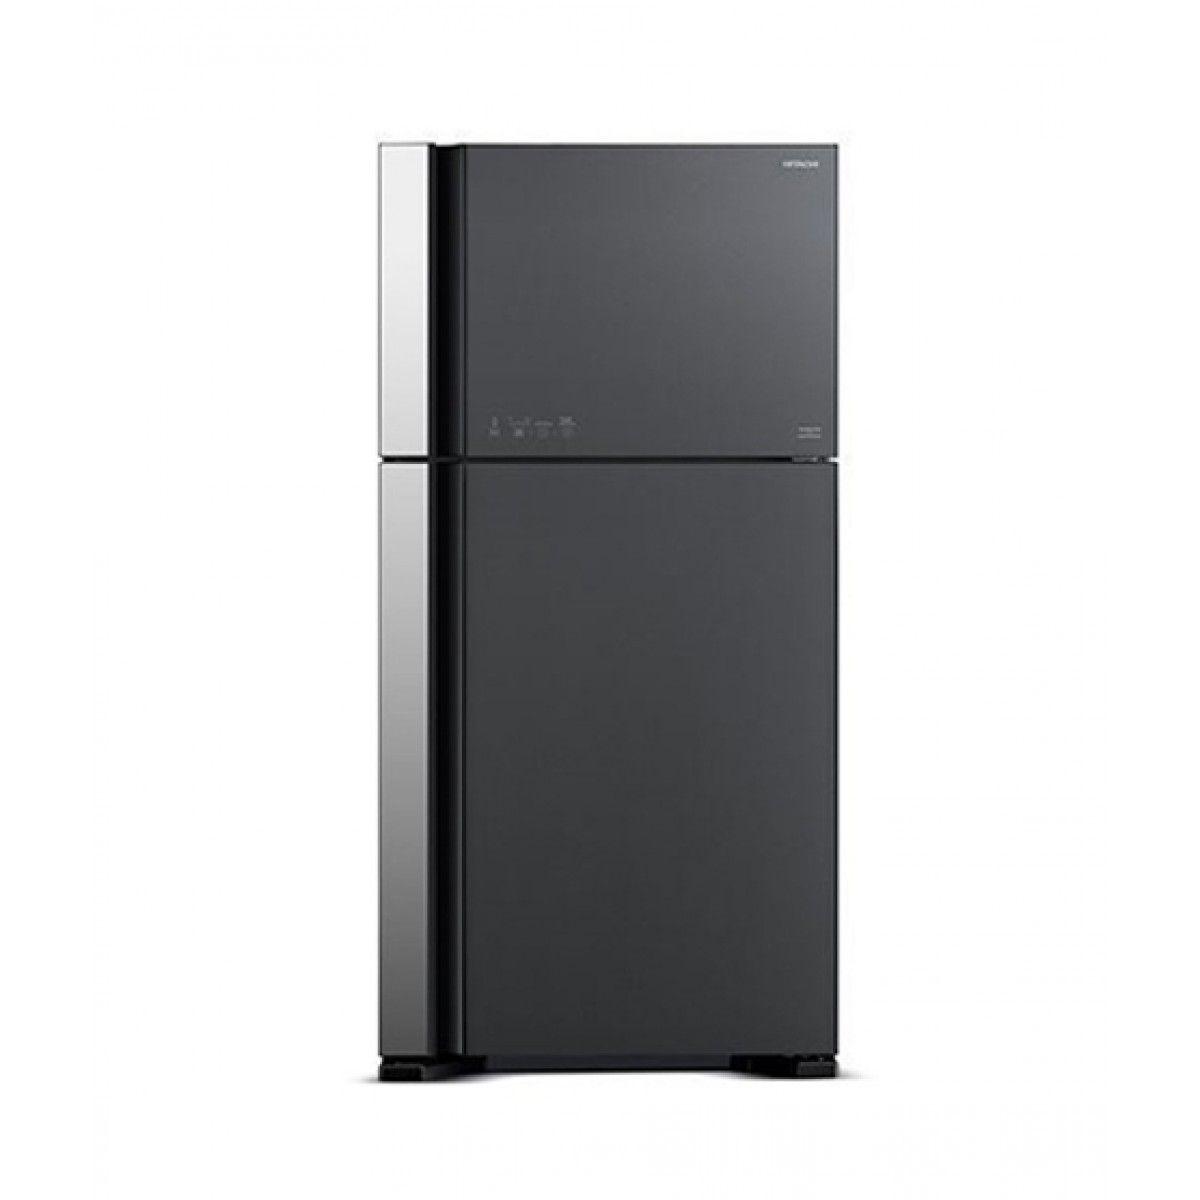 Hitachi (R-VG630P3PB) Freezer-on-Top 20 cu ft Refrigerator